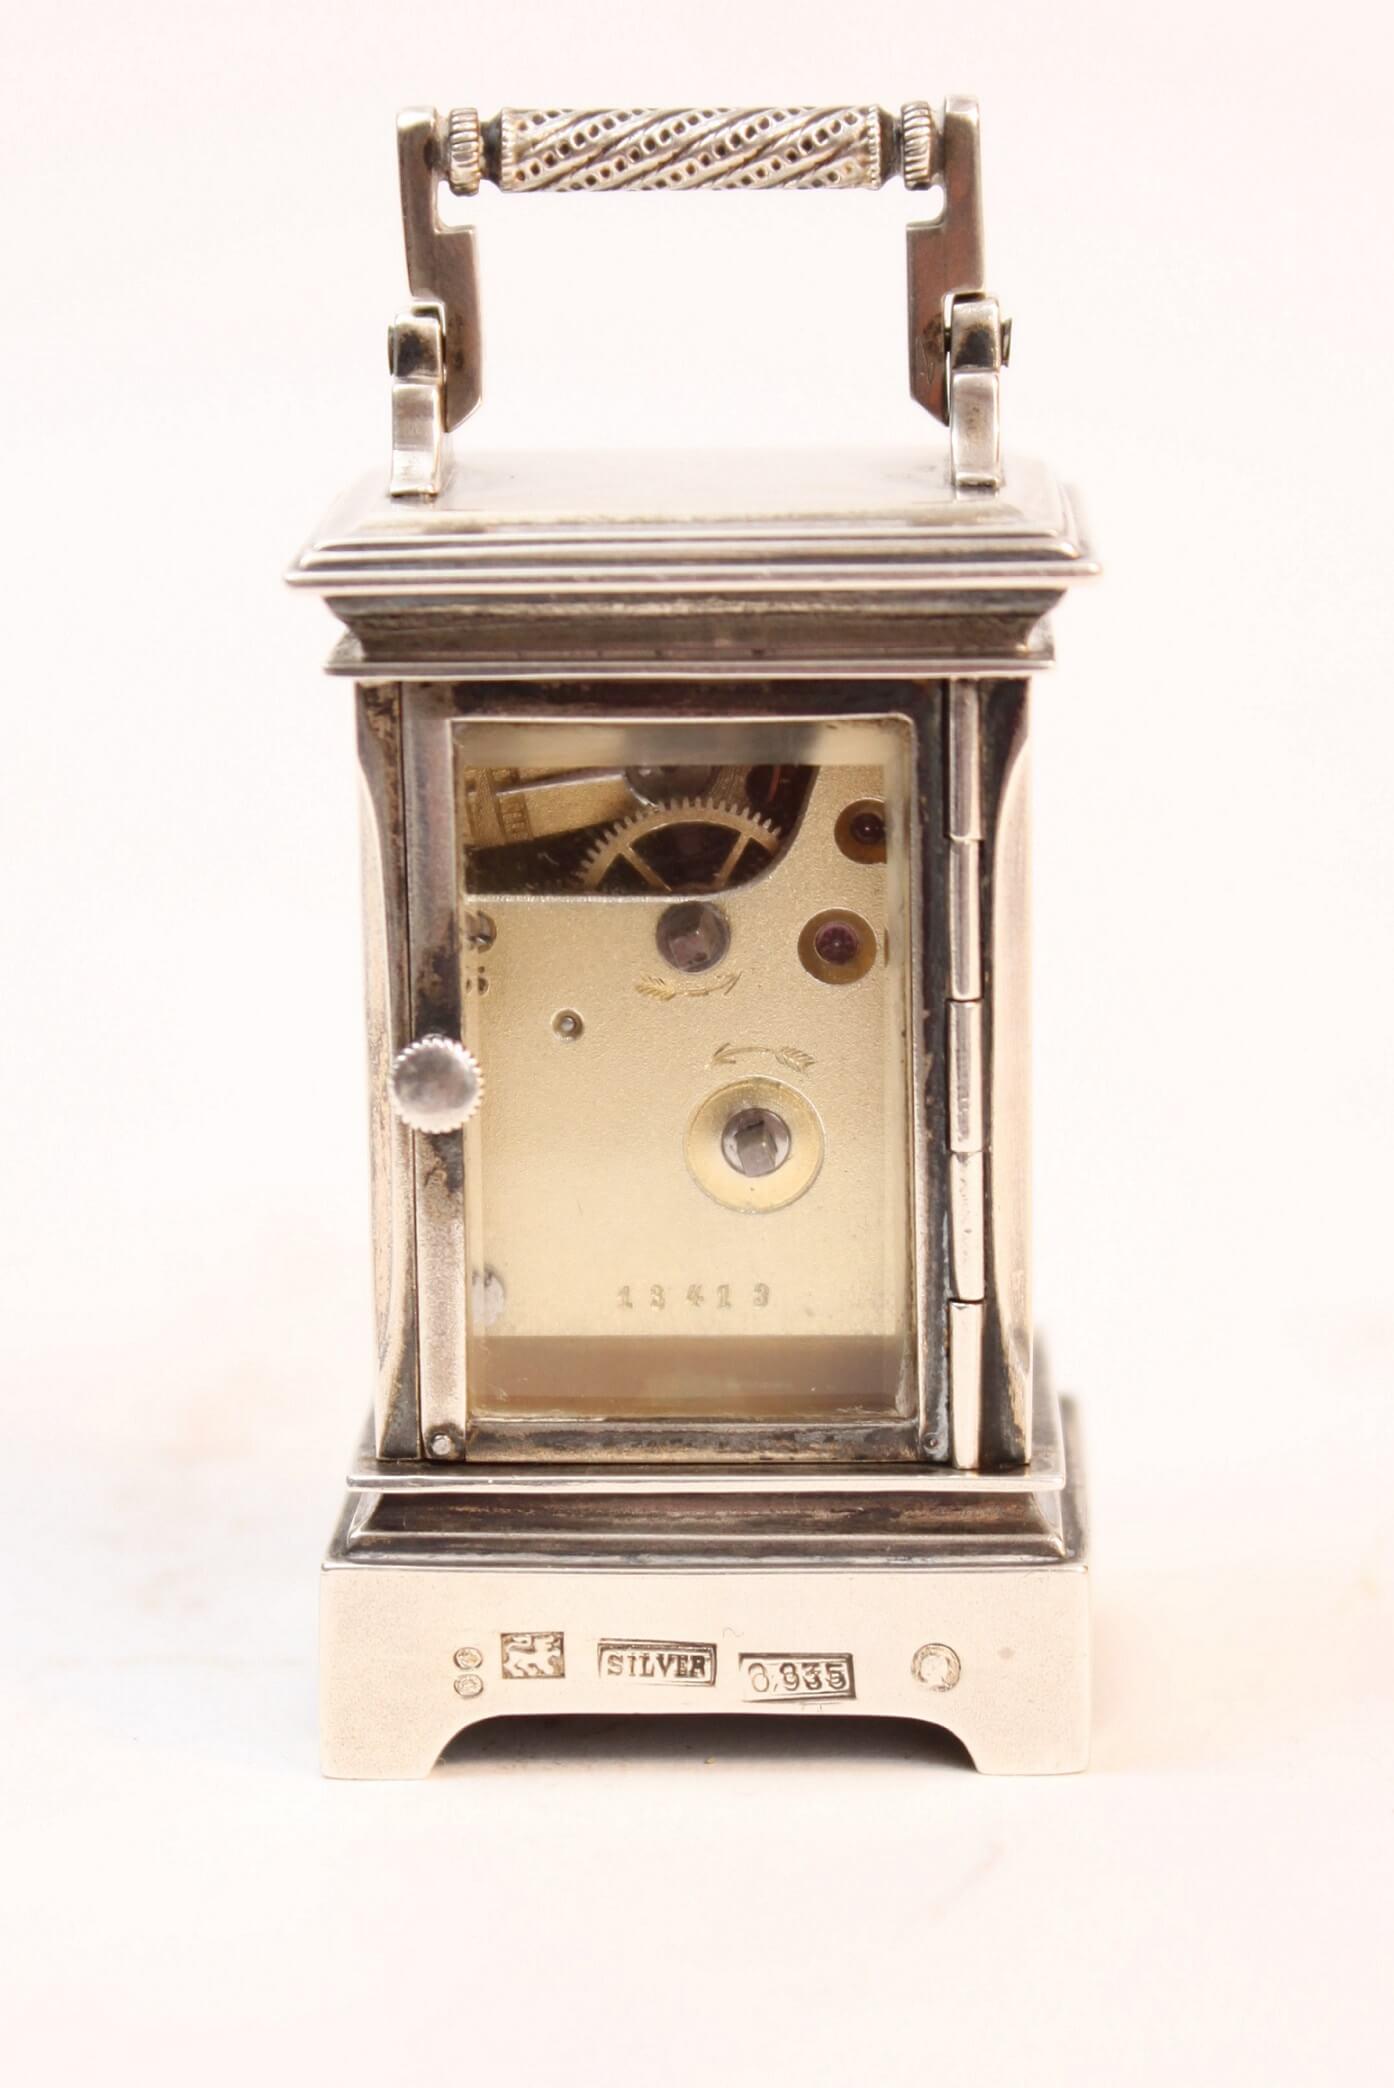 miniature-Swiss-silver-guilloche-translucent-enamel-travel-carriage-clock-sub miniature-